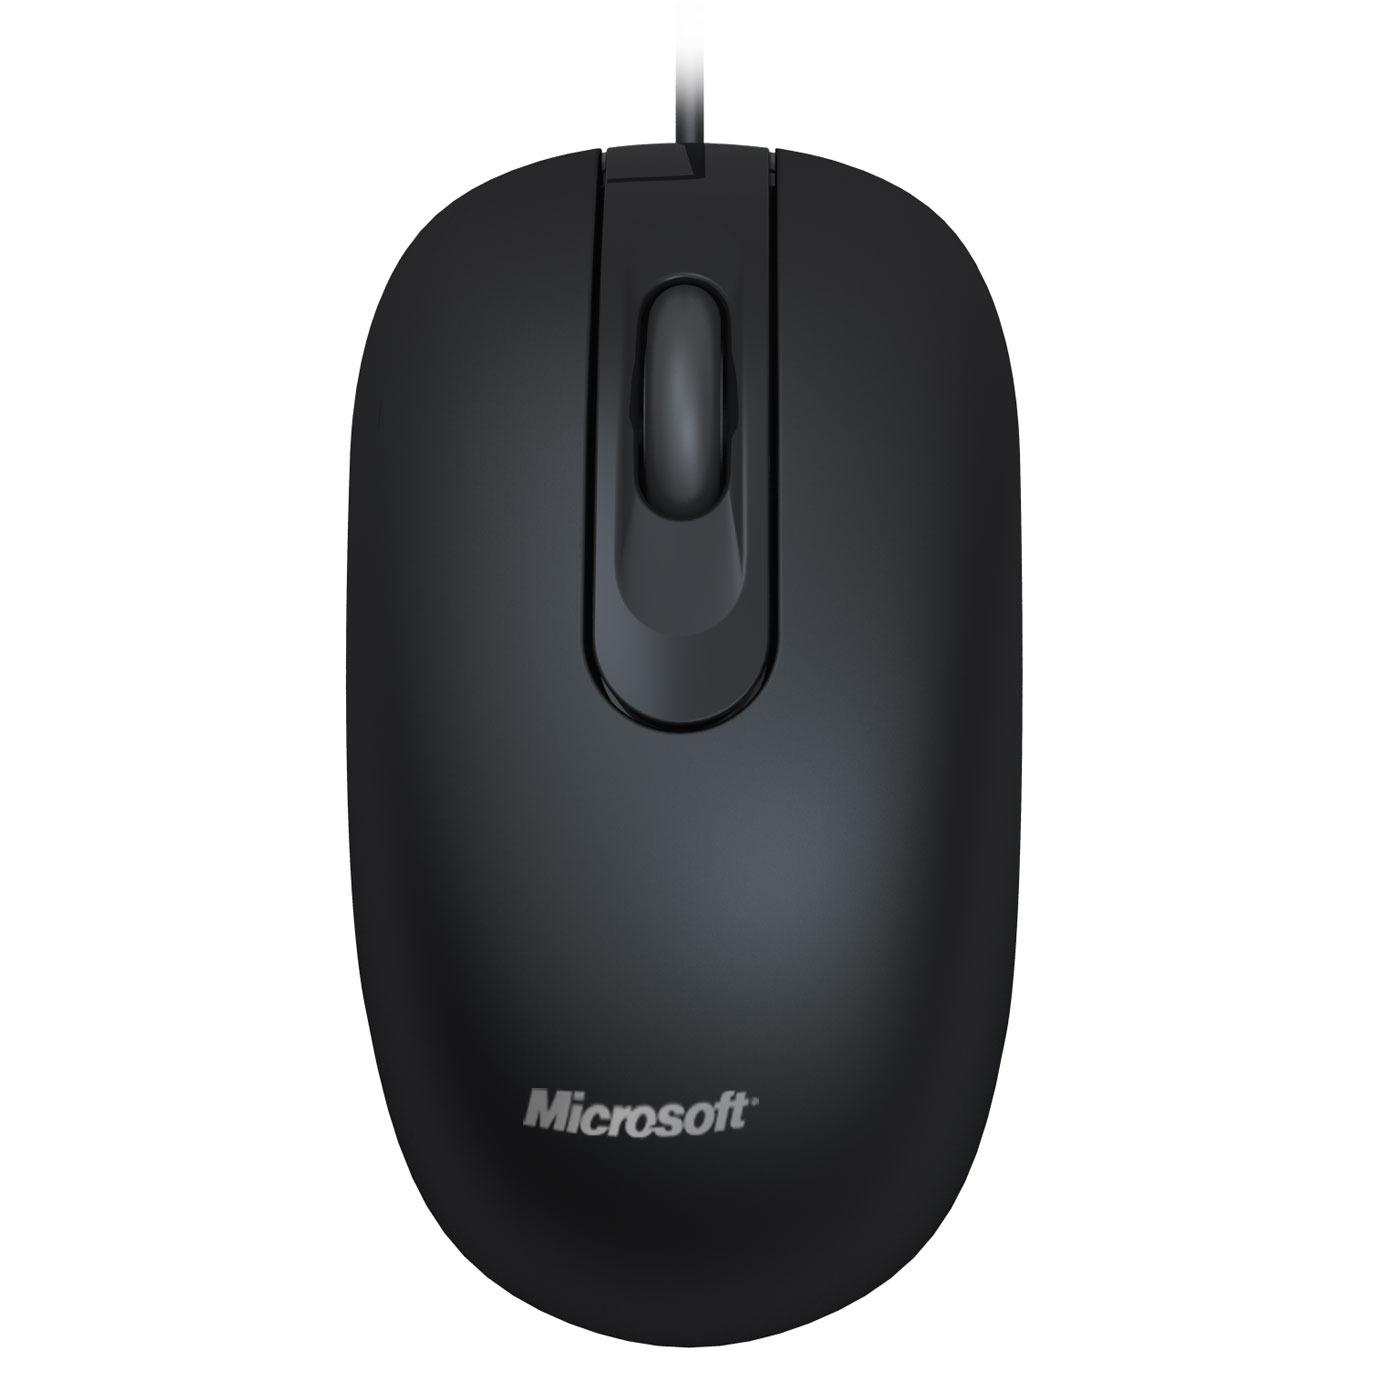 Souris Microsoft Optical Mouse 200